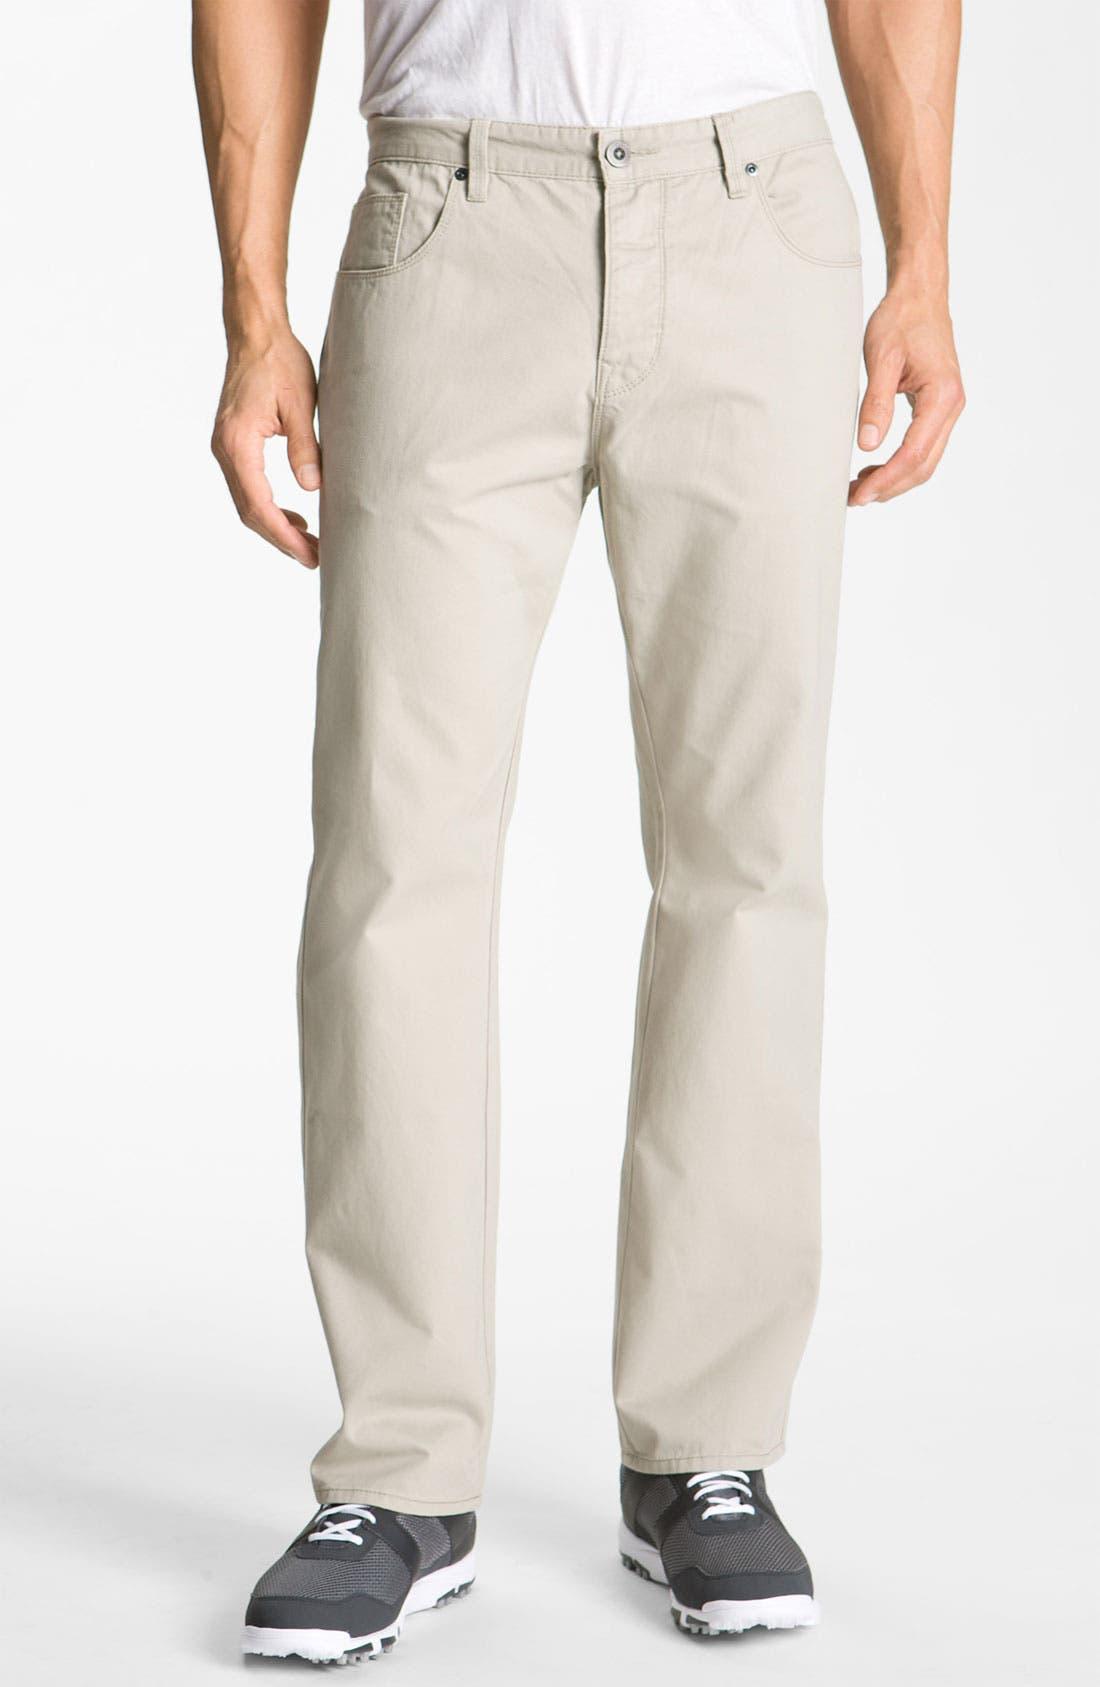 Alternate Image 1 Selected - Cutter & Buck 'Pike' Five-Pocket Pants (Big & Tall)